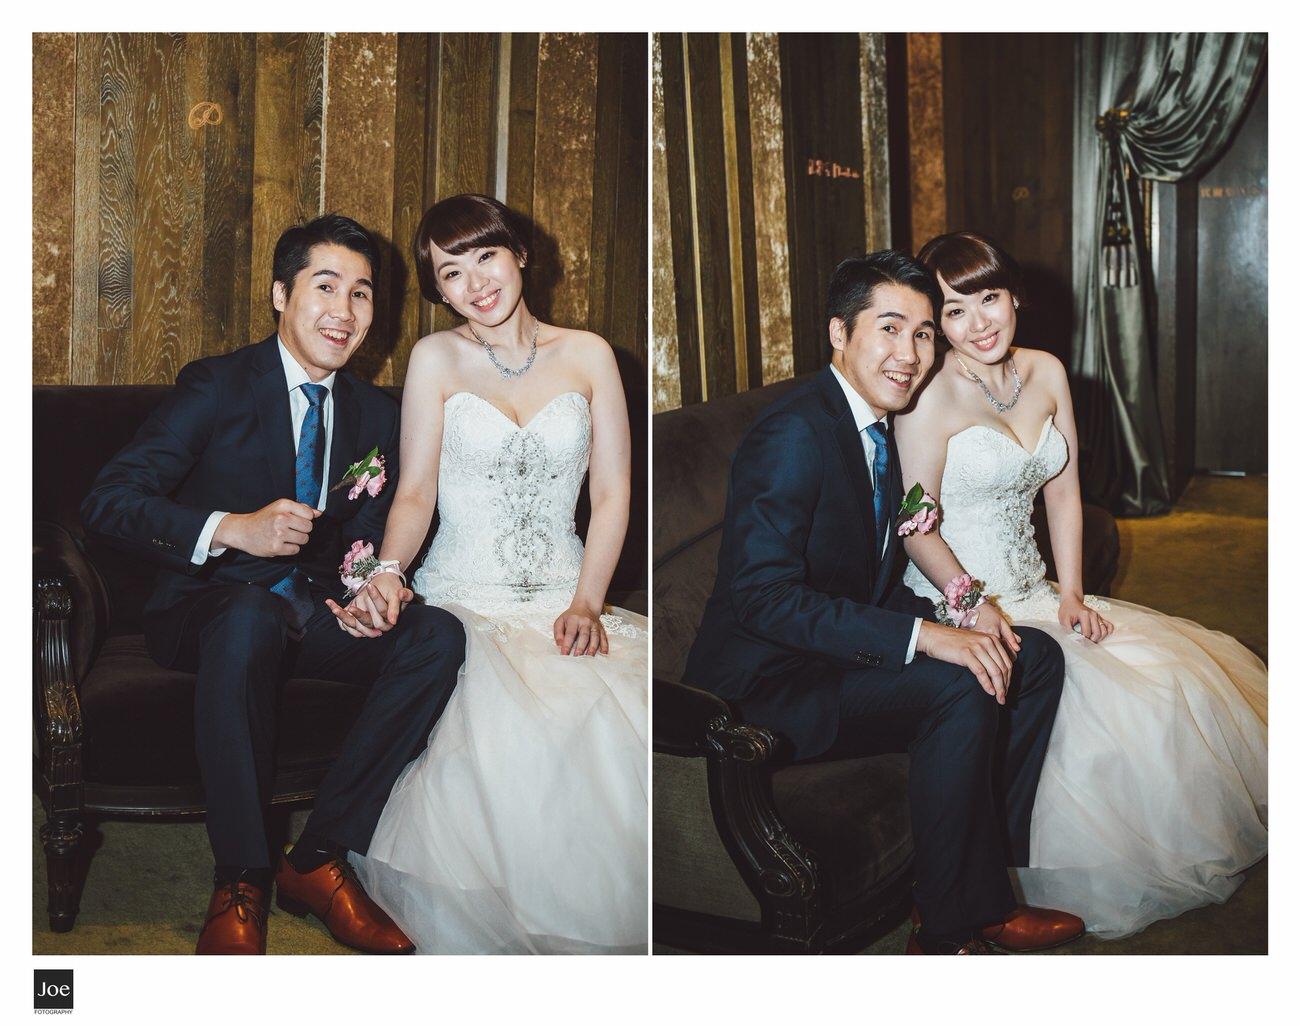 joe-fotography-wedding-photo-palais-de-chine-hotel-020.jpg